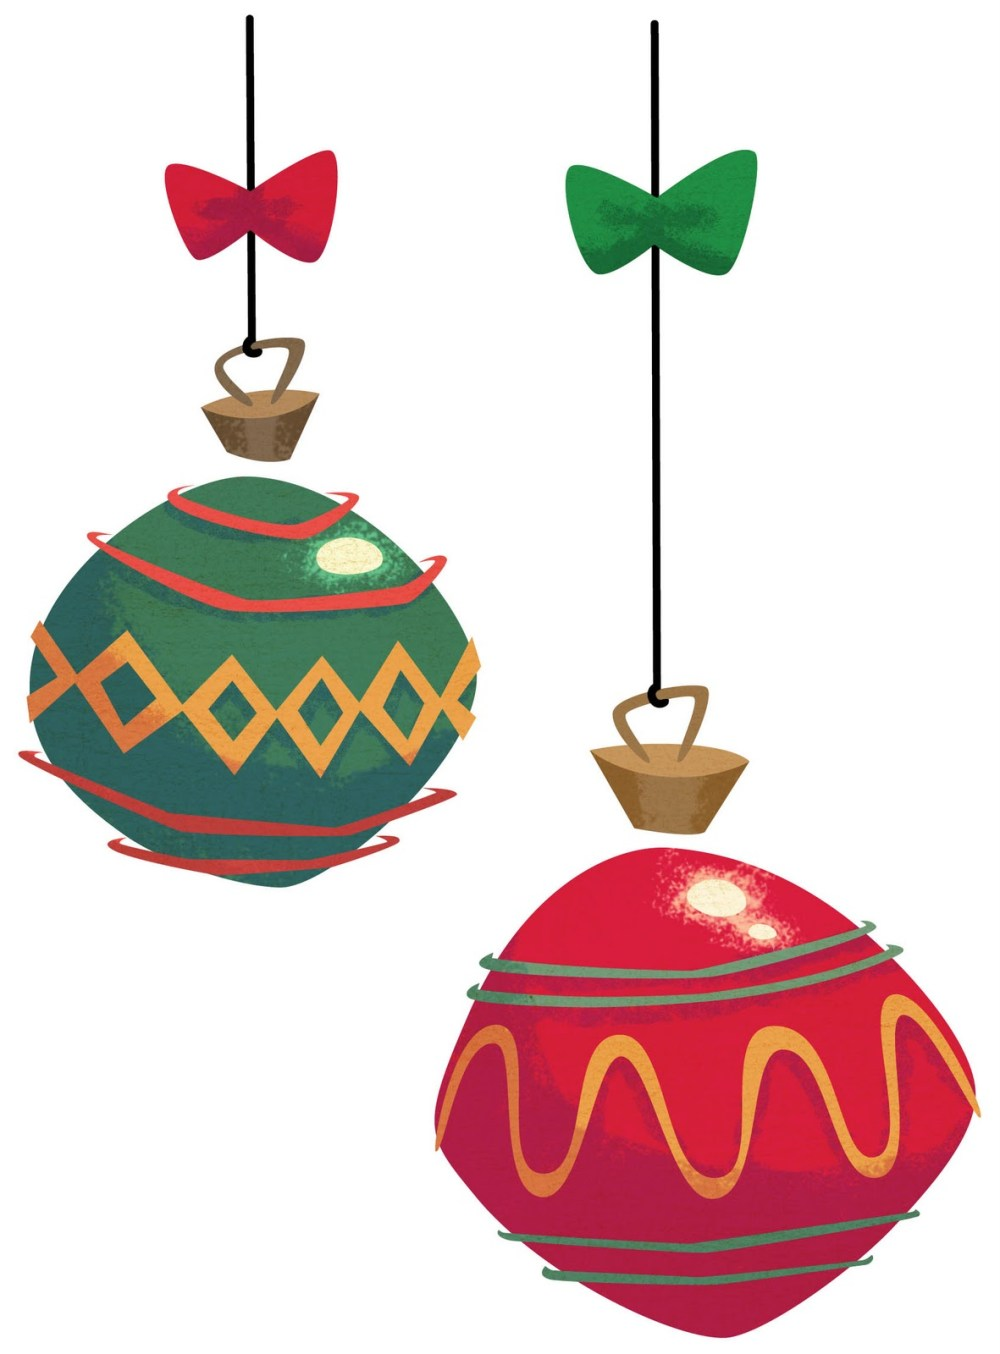 medium resolution of xmas stuff for christmas ornaments clip art